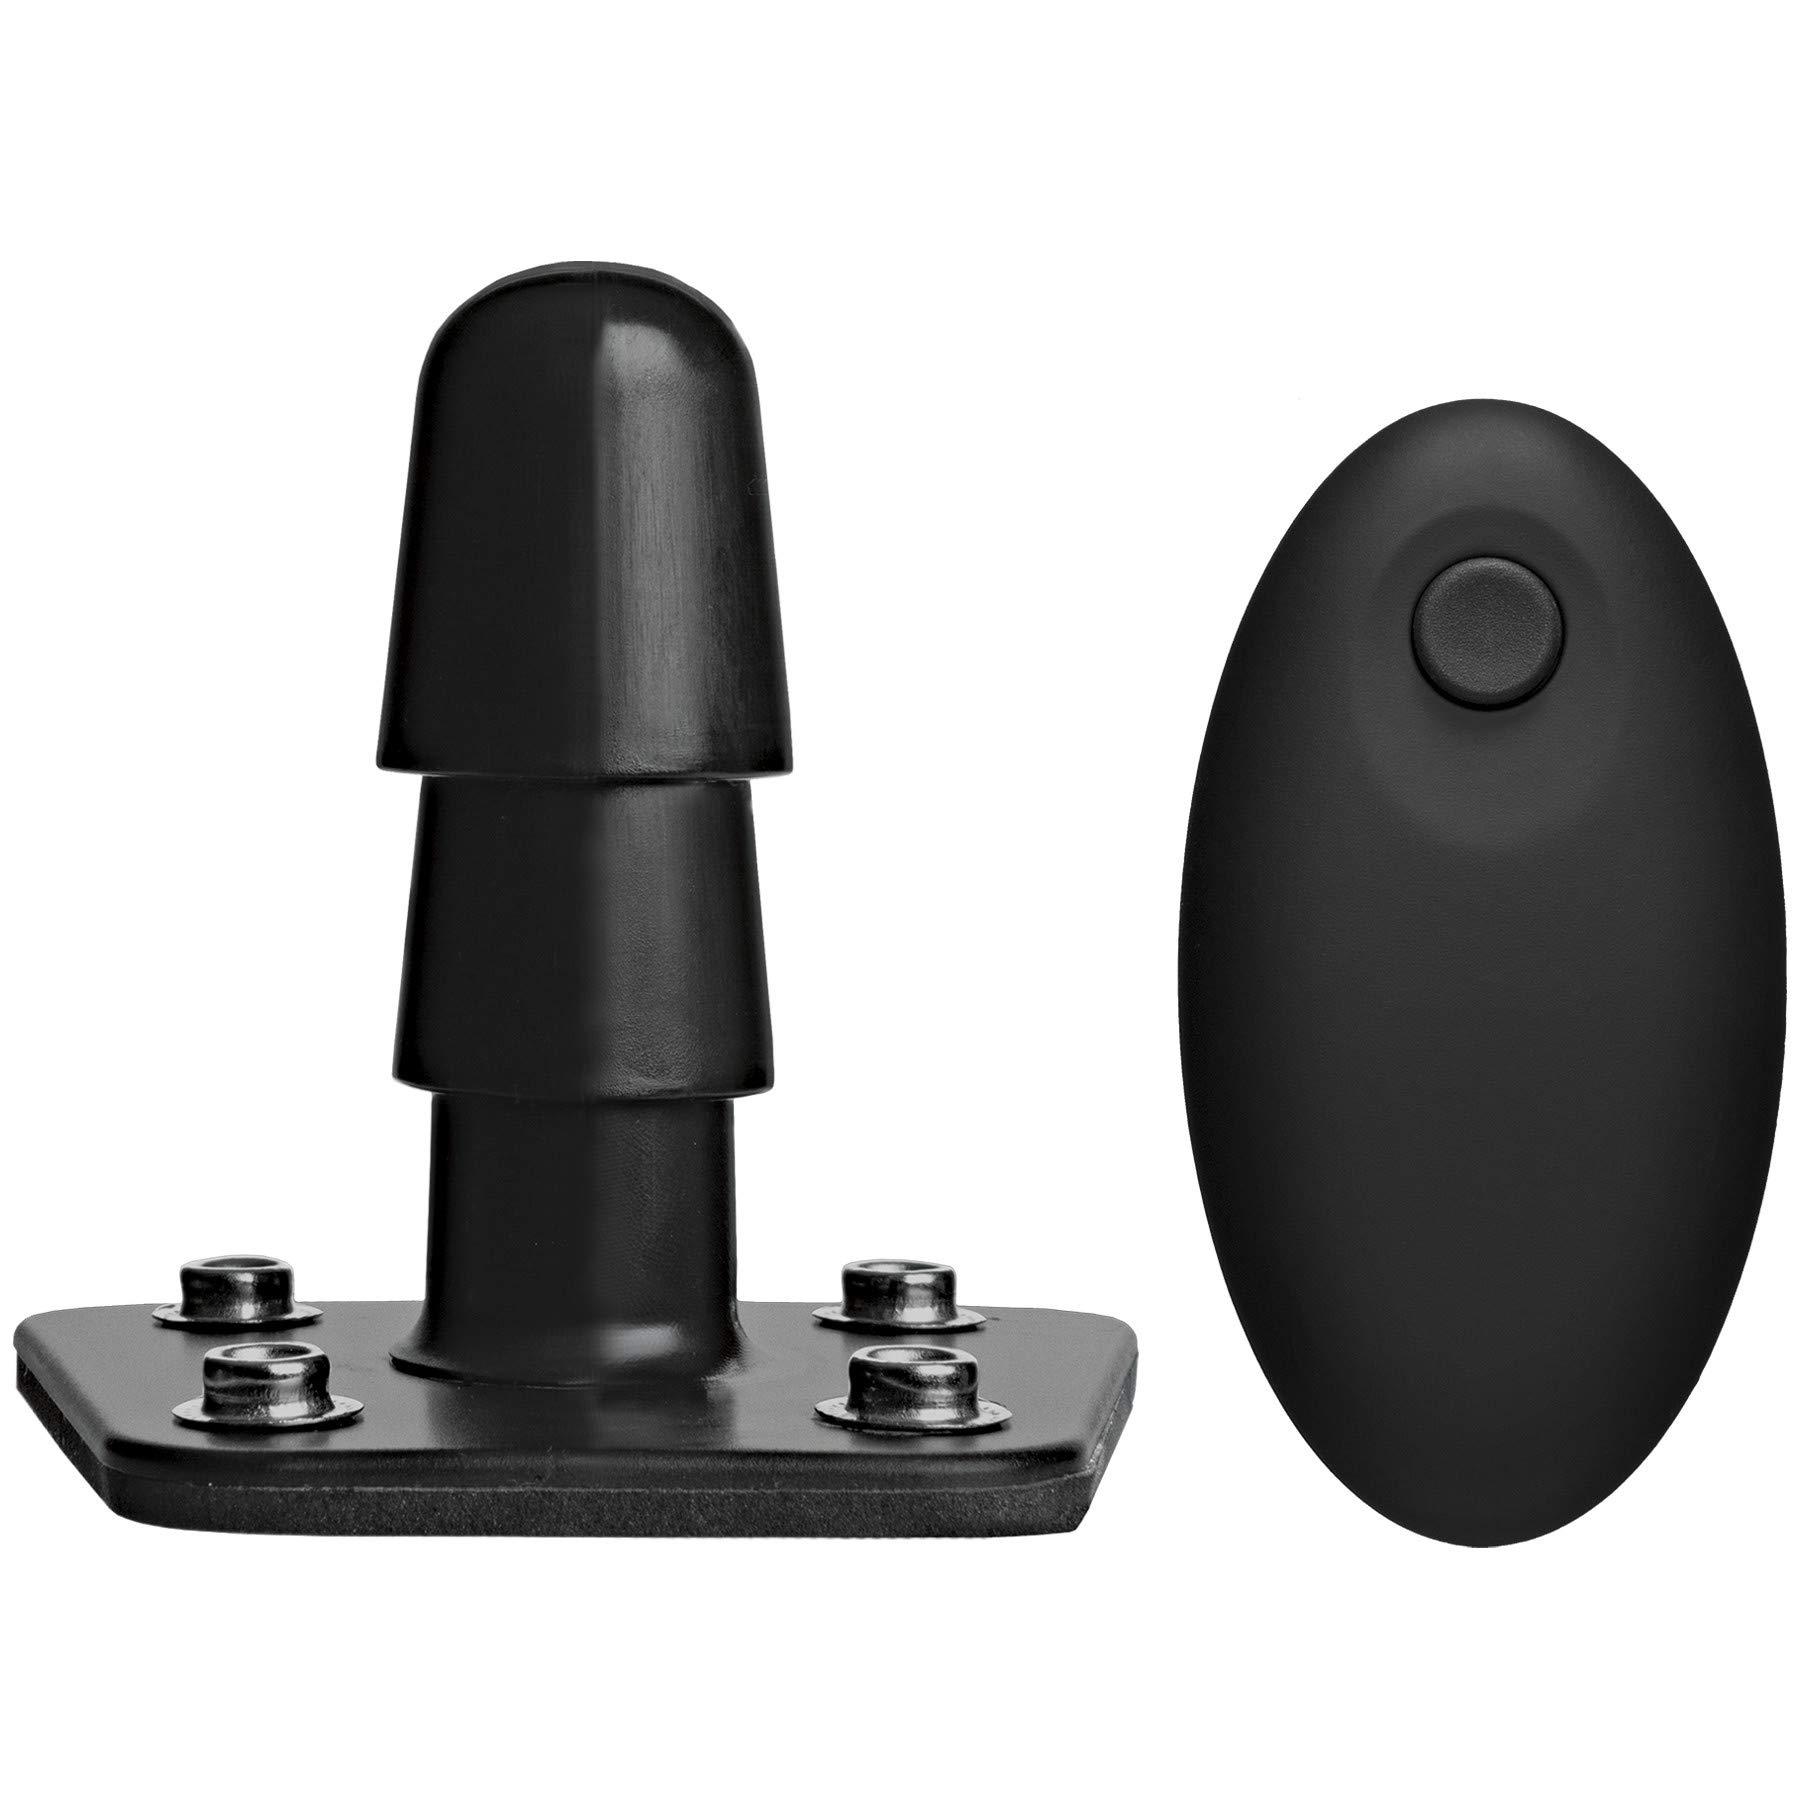 Doc Johnson Vac-u-Lock Vibrating Plug with Wireless Remote 7 Vibrating Functions, Black